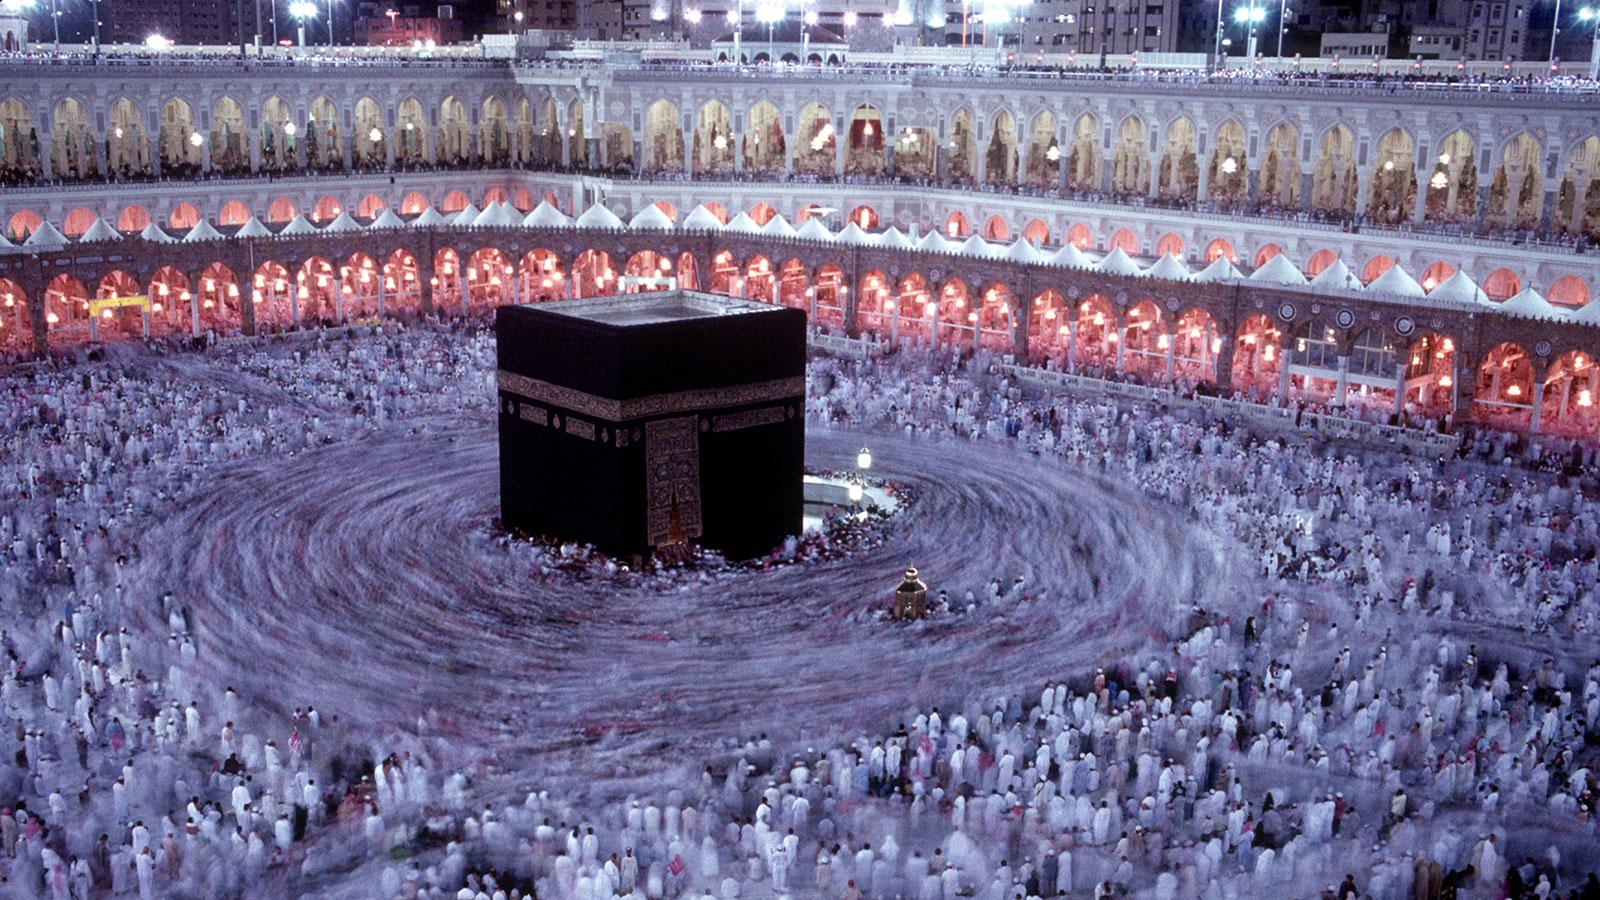 Sunni muslim beliefs